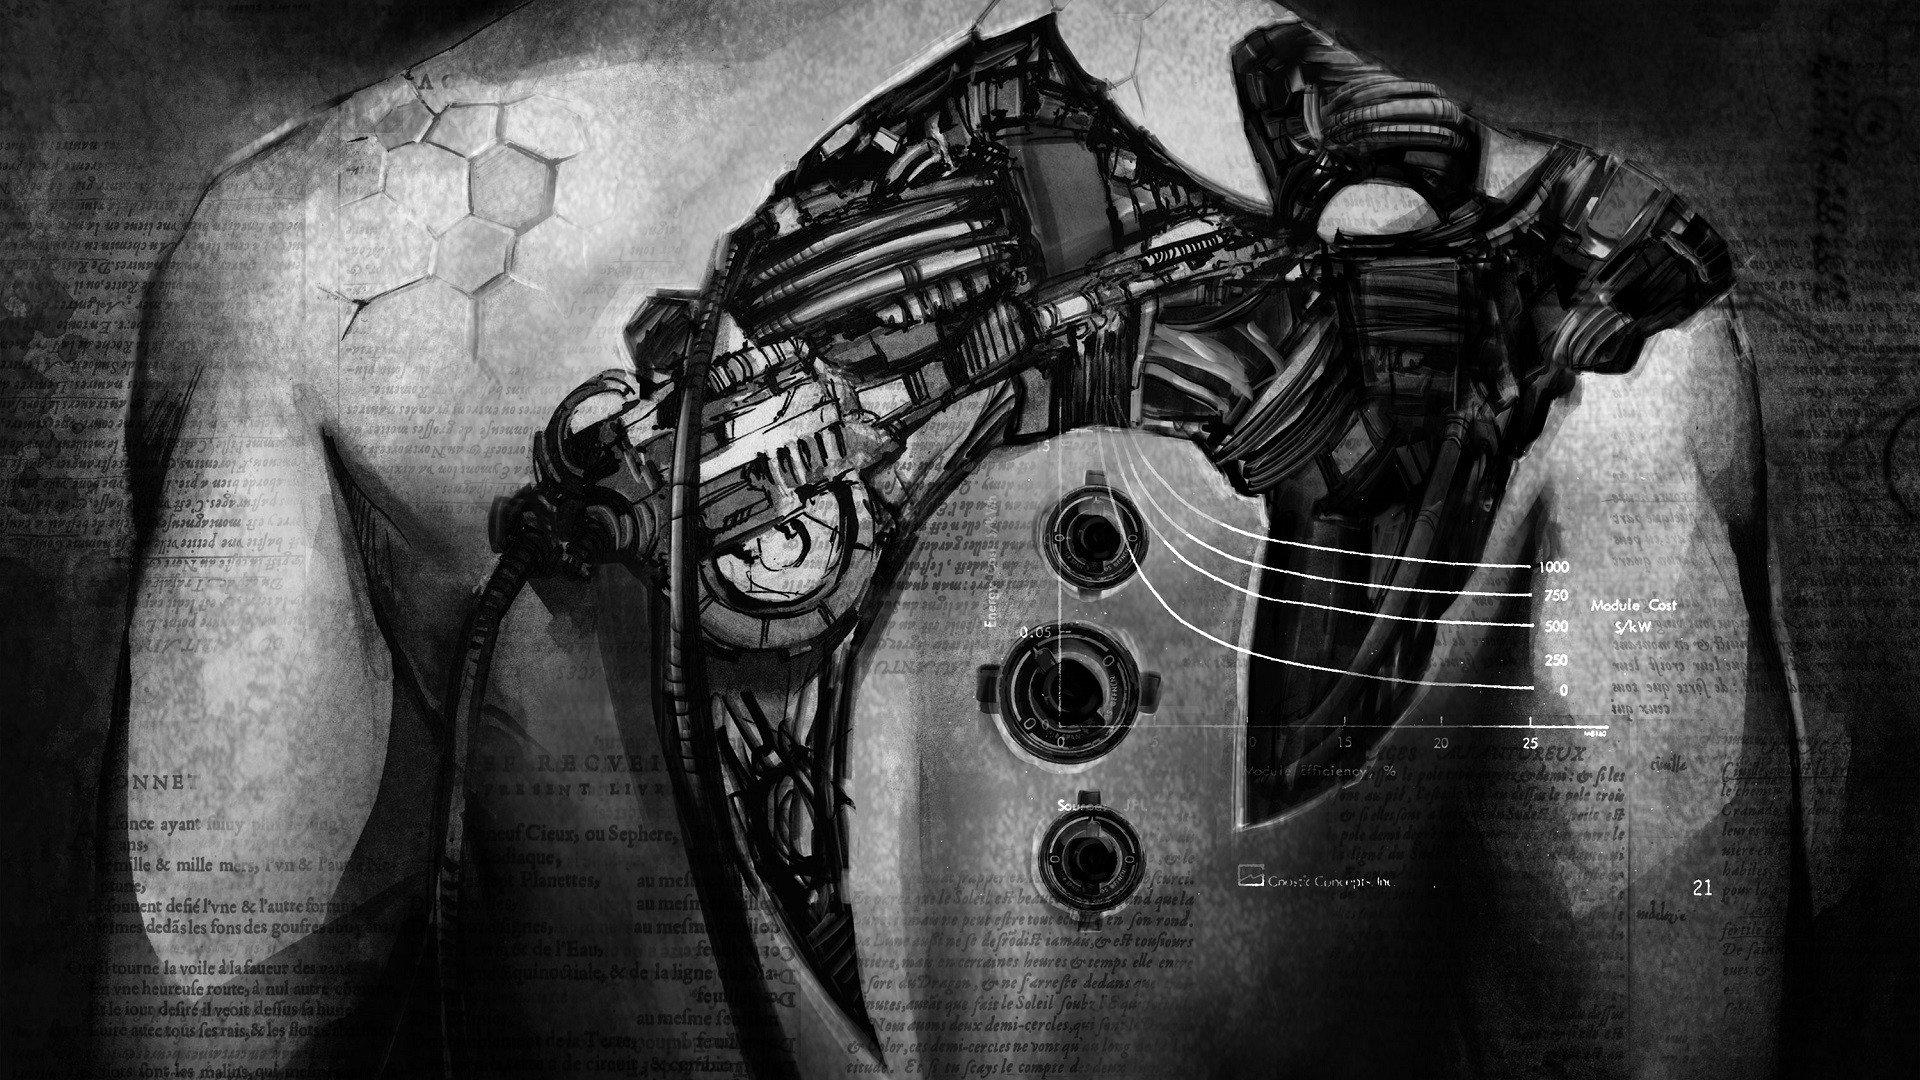 Klayton, Circle of Dust, Monochrome, Robot, Wires, Cyberpunk Wallpaper